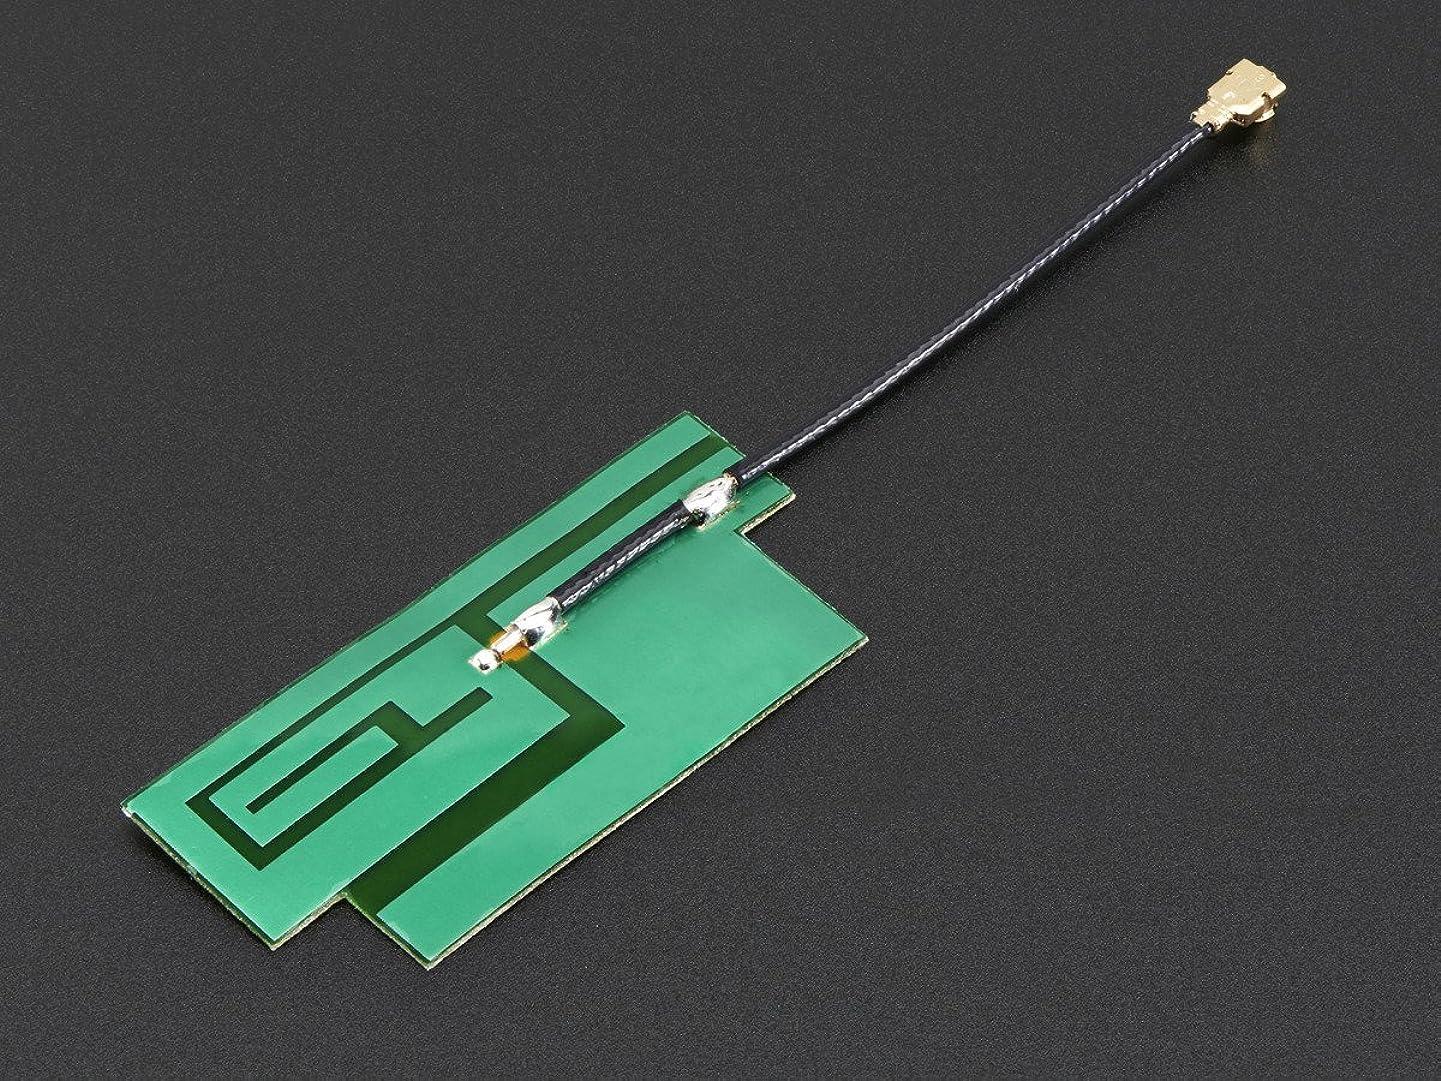 Adafruit Slim Sticker-type GSM/Cellular Quad-Band Antenna - 3dBi uFL [ADA1991]